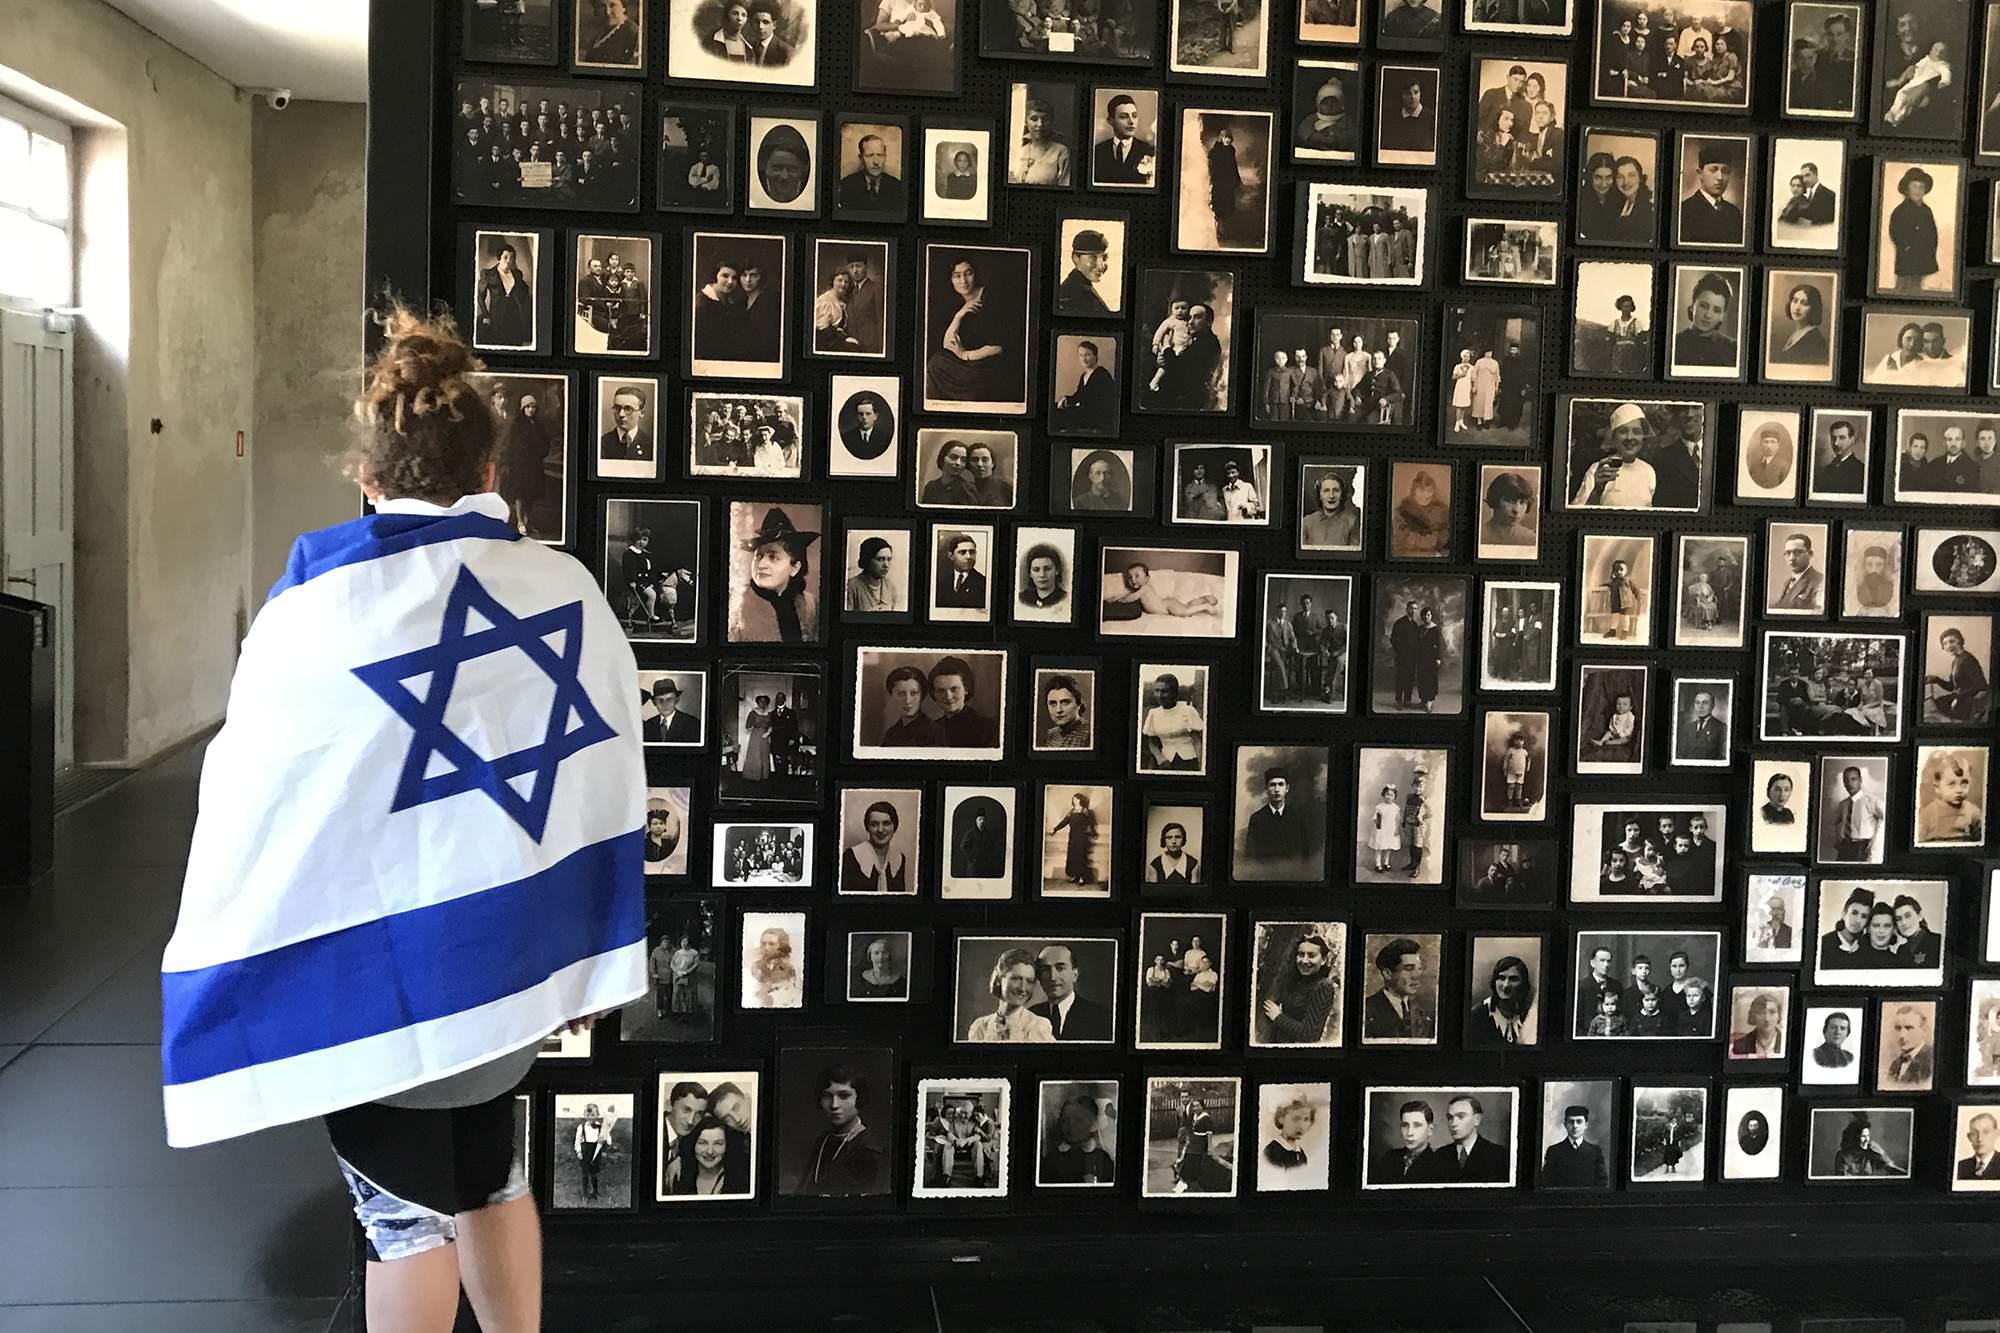 Israel Pilgrimage / Poland Seminar